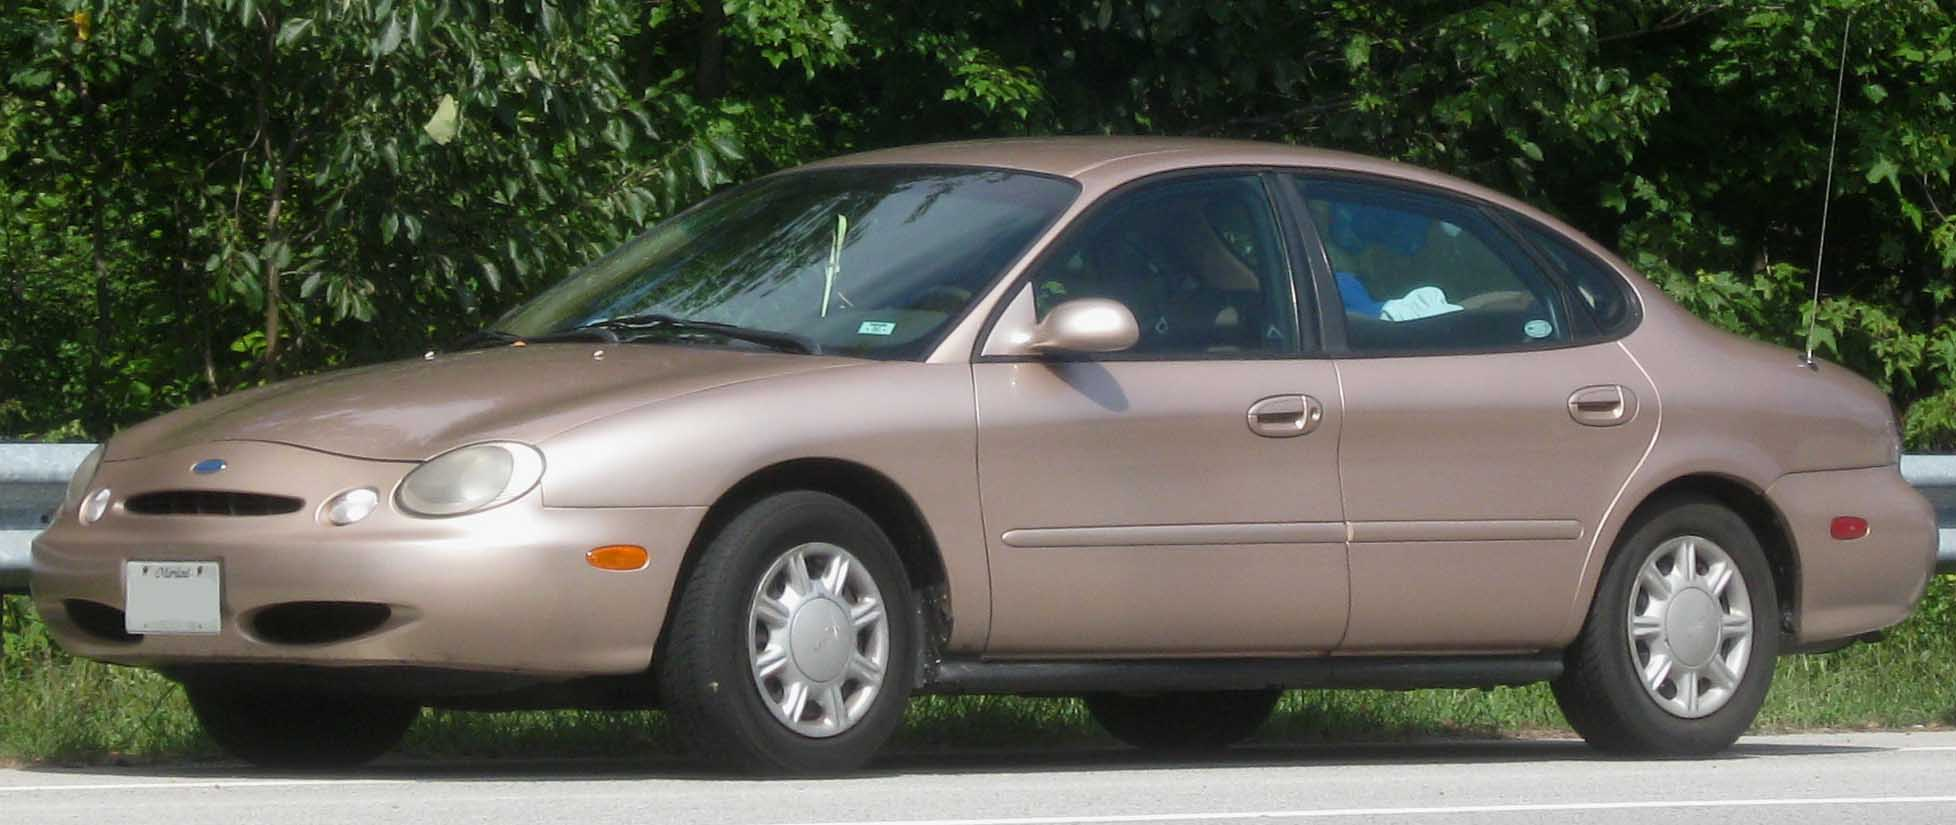 1997 ford taurus image 2